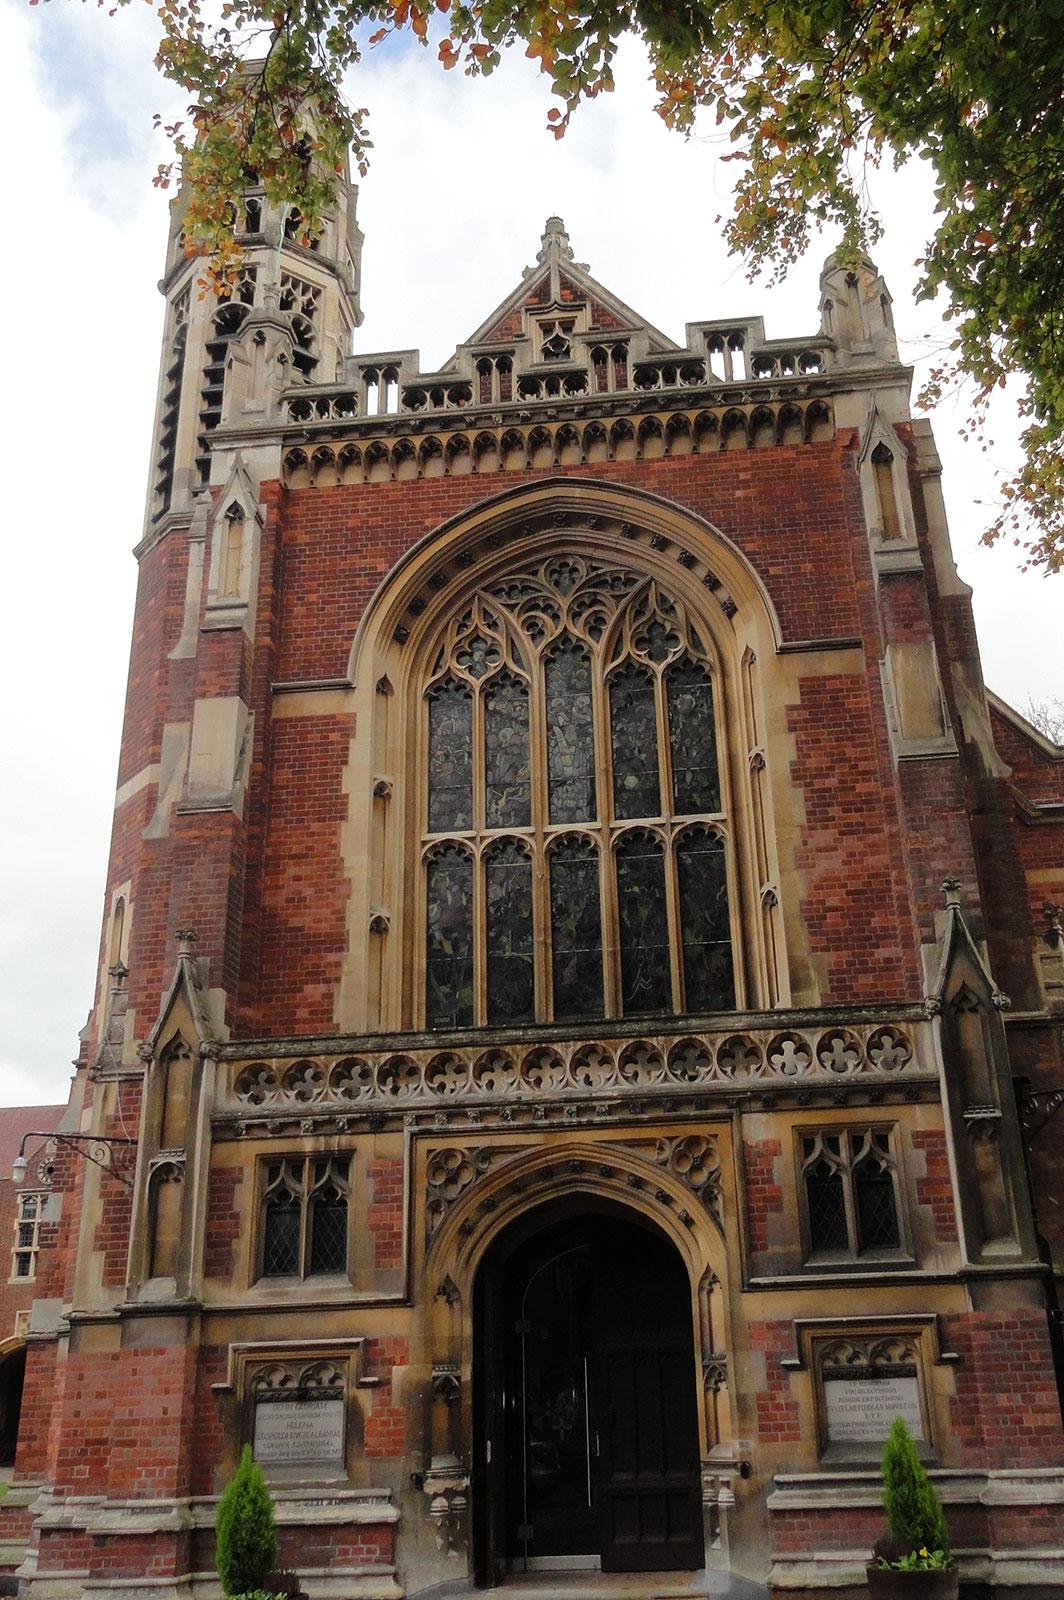 Arched Glass Entrance Doors at Leys School, Cambridge